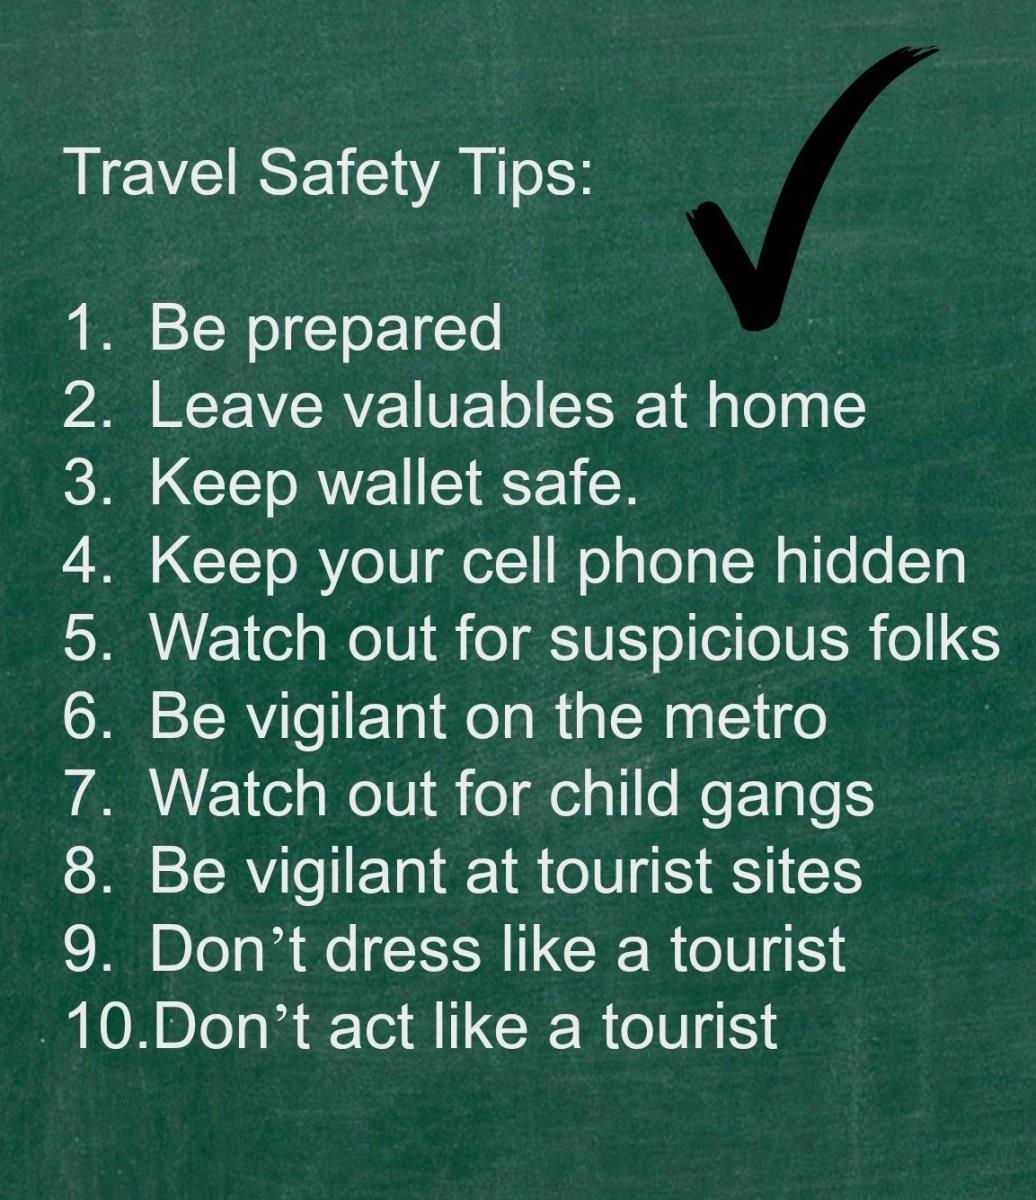 Tourist Safety Tips - PARIS Version